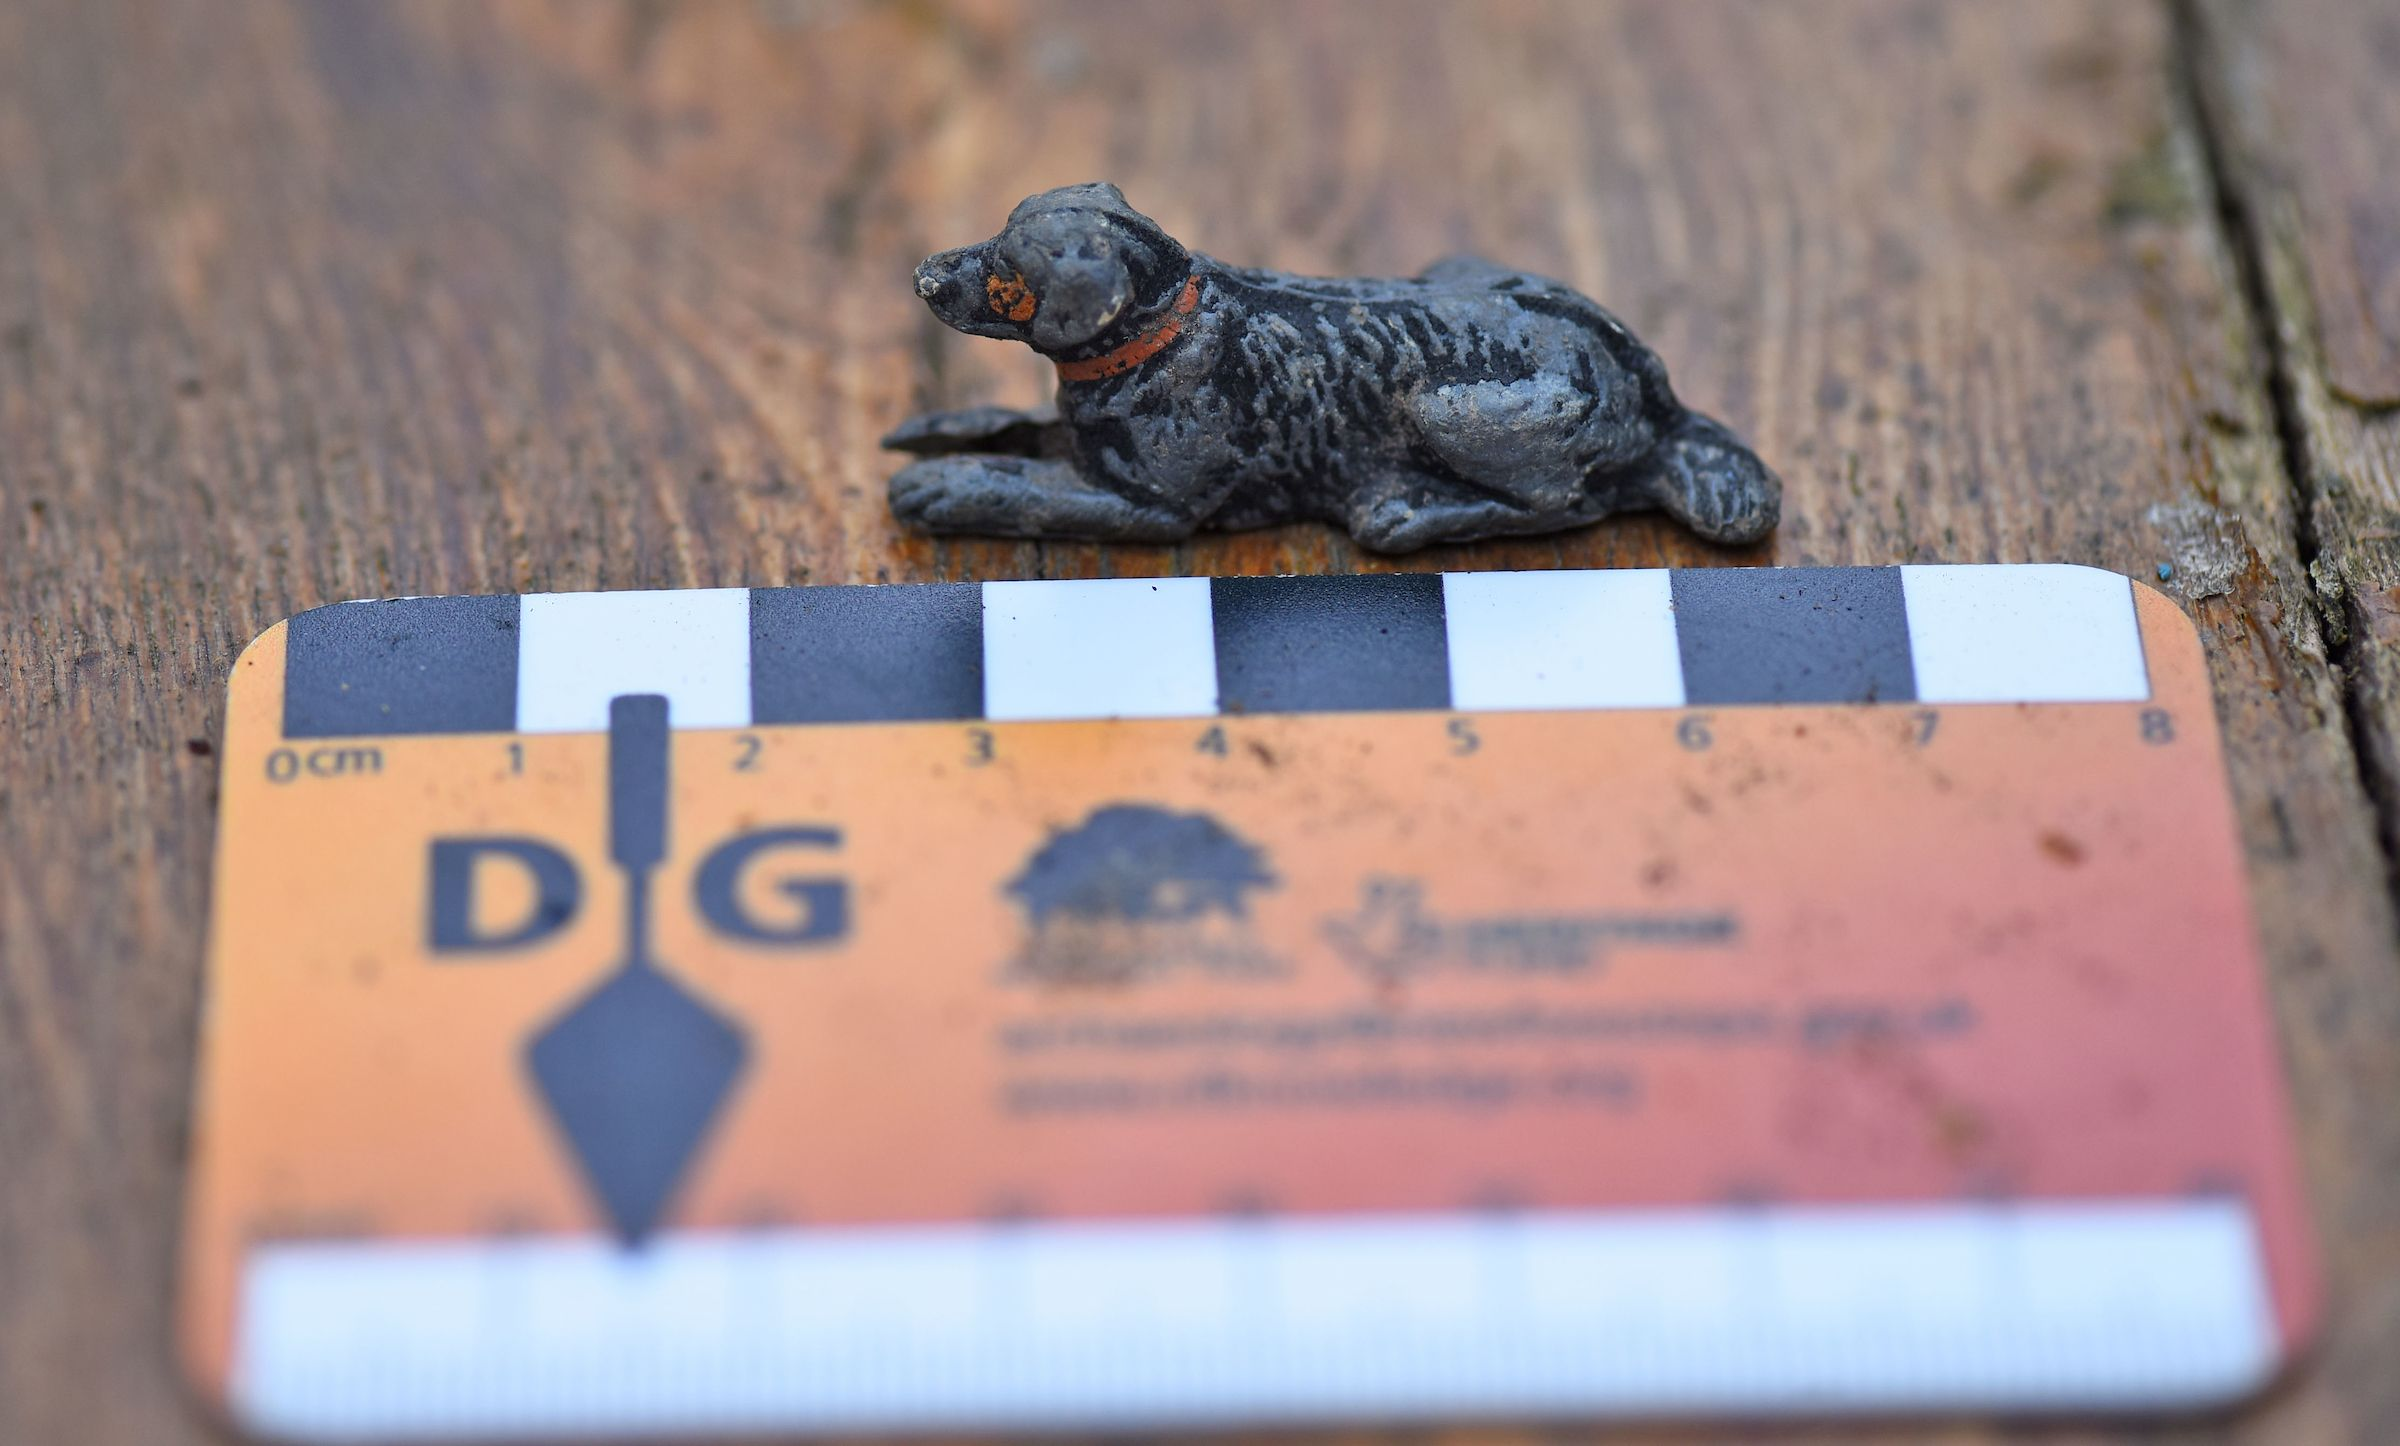 Dig Burley find, small dog